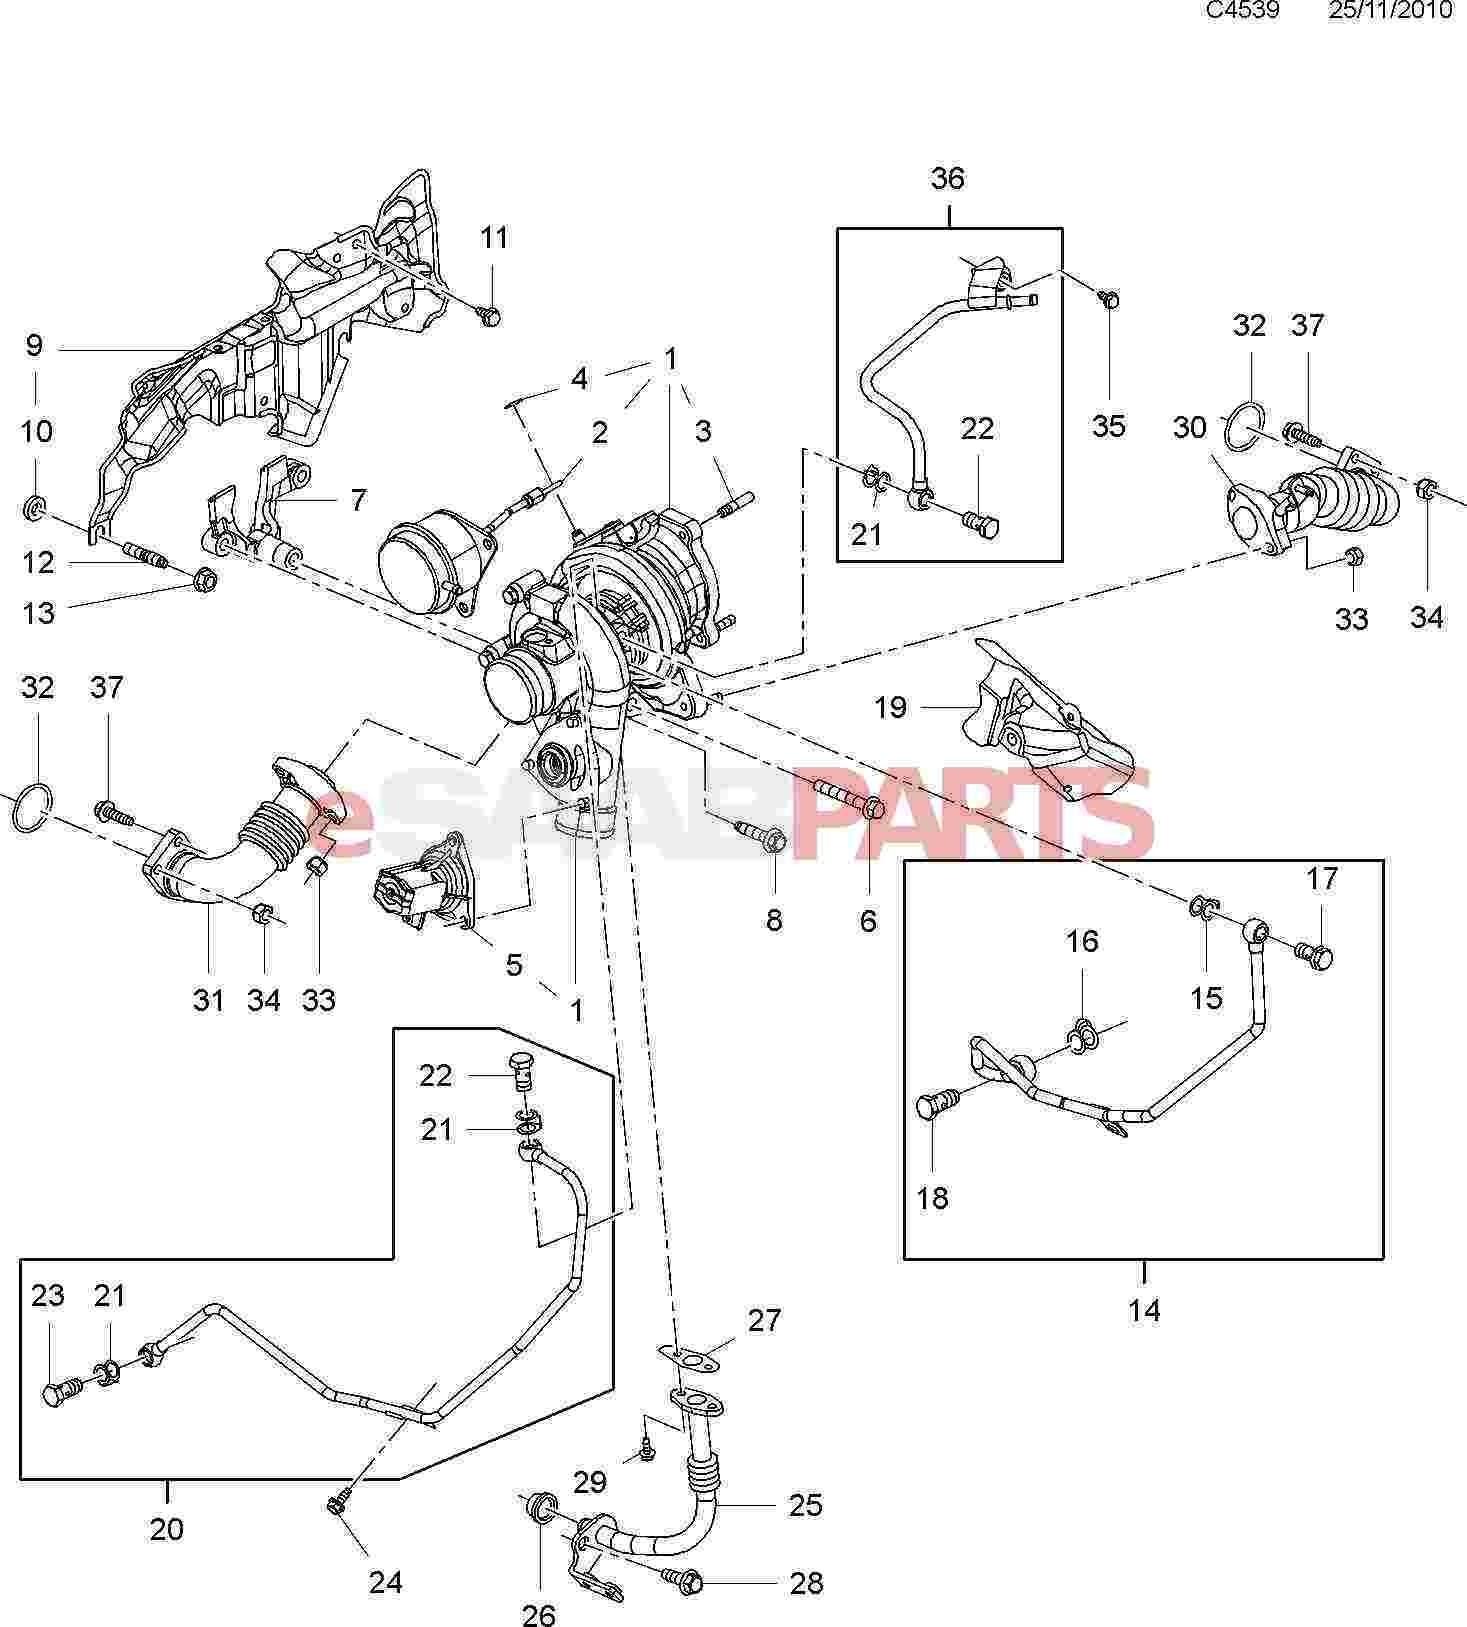 gm 21 pin radio harness diagram